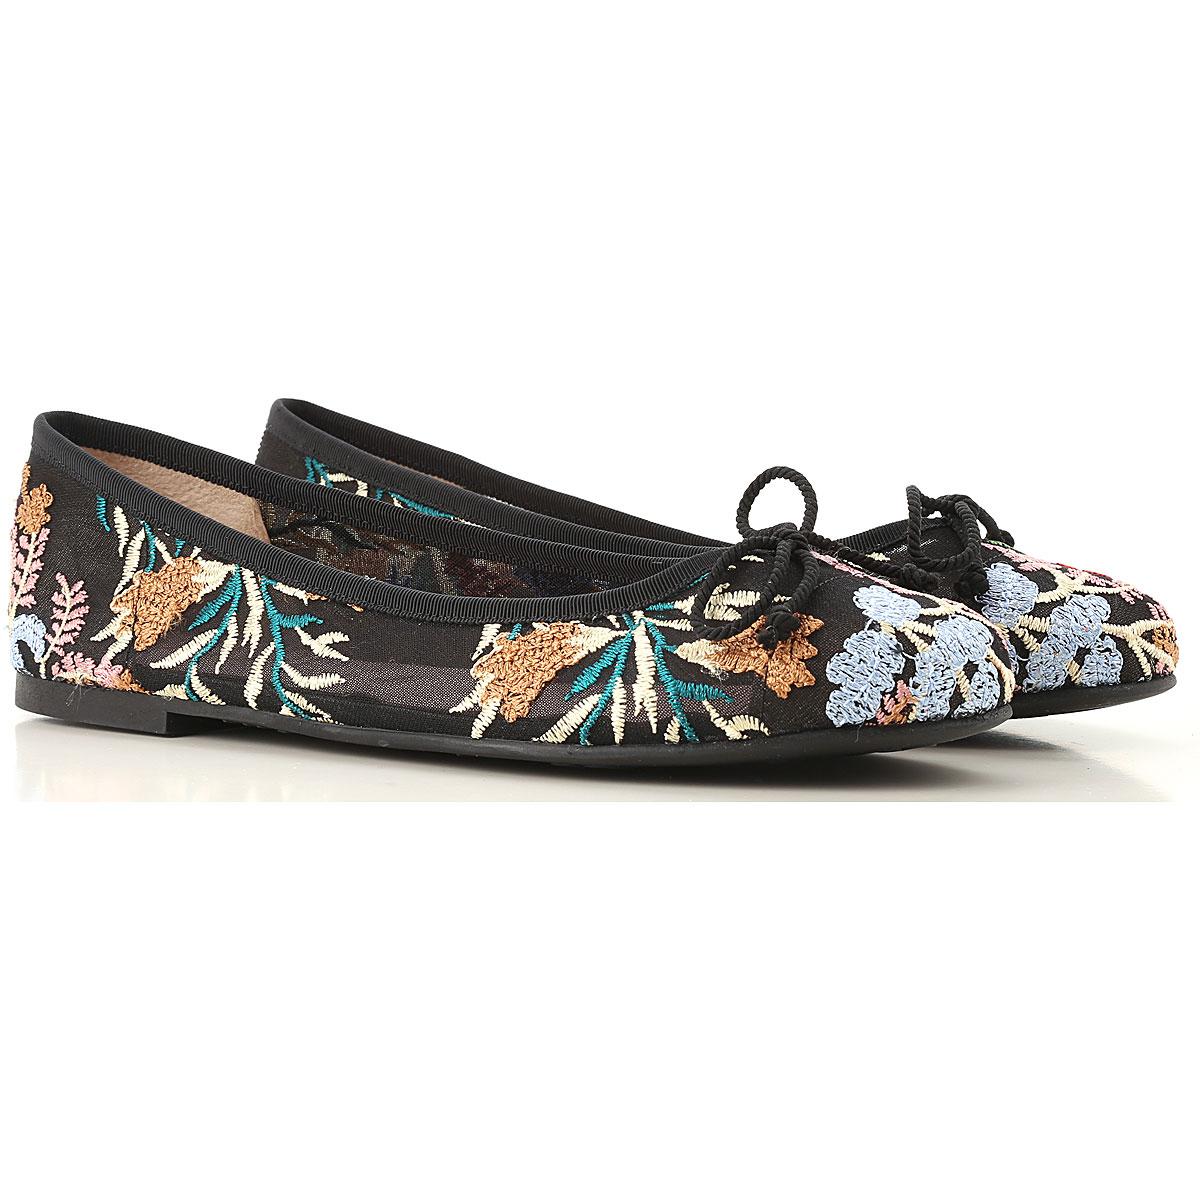 Pretty Ballerinas Ballet Flats Ballerina Shoes for Women On Sale in Outlet, Black, Nylon, 2019, 8 9